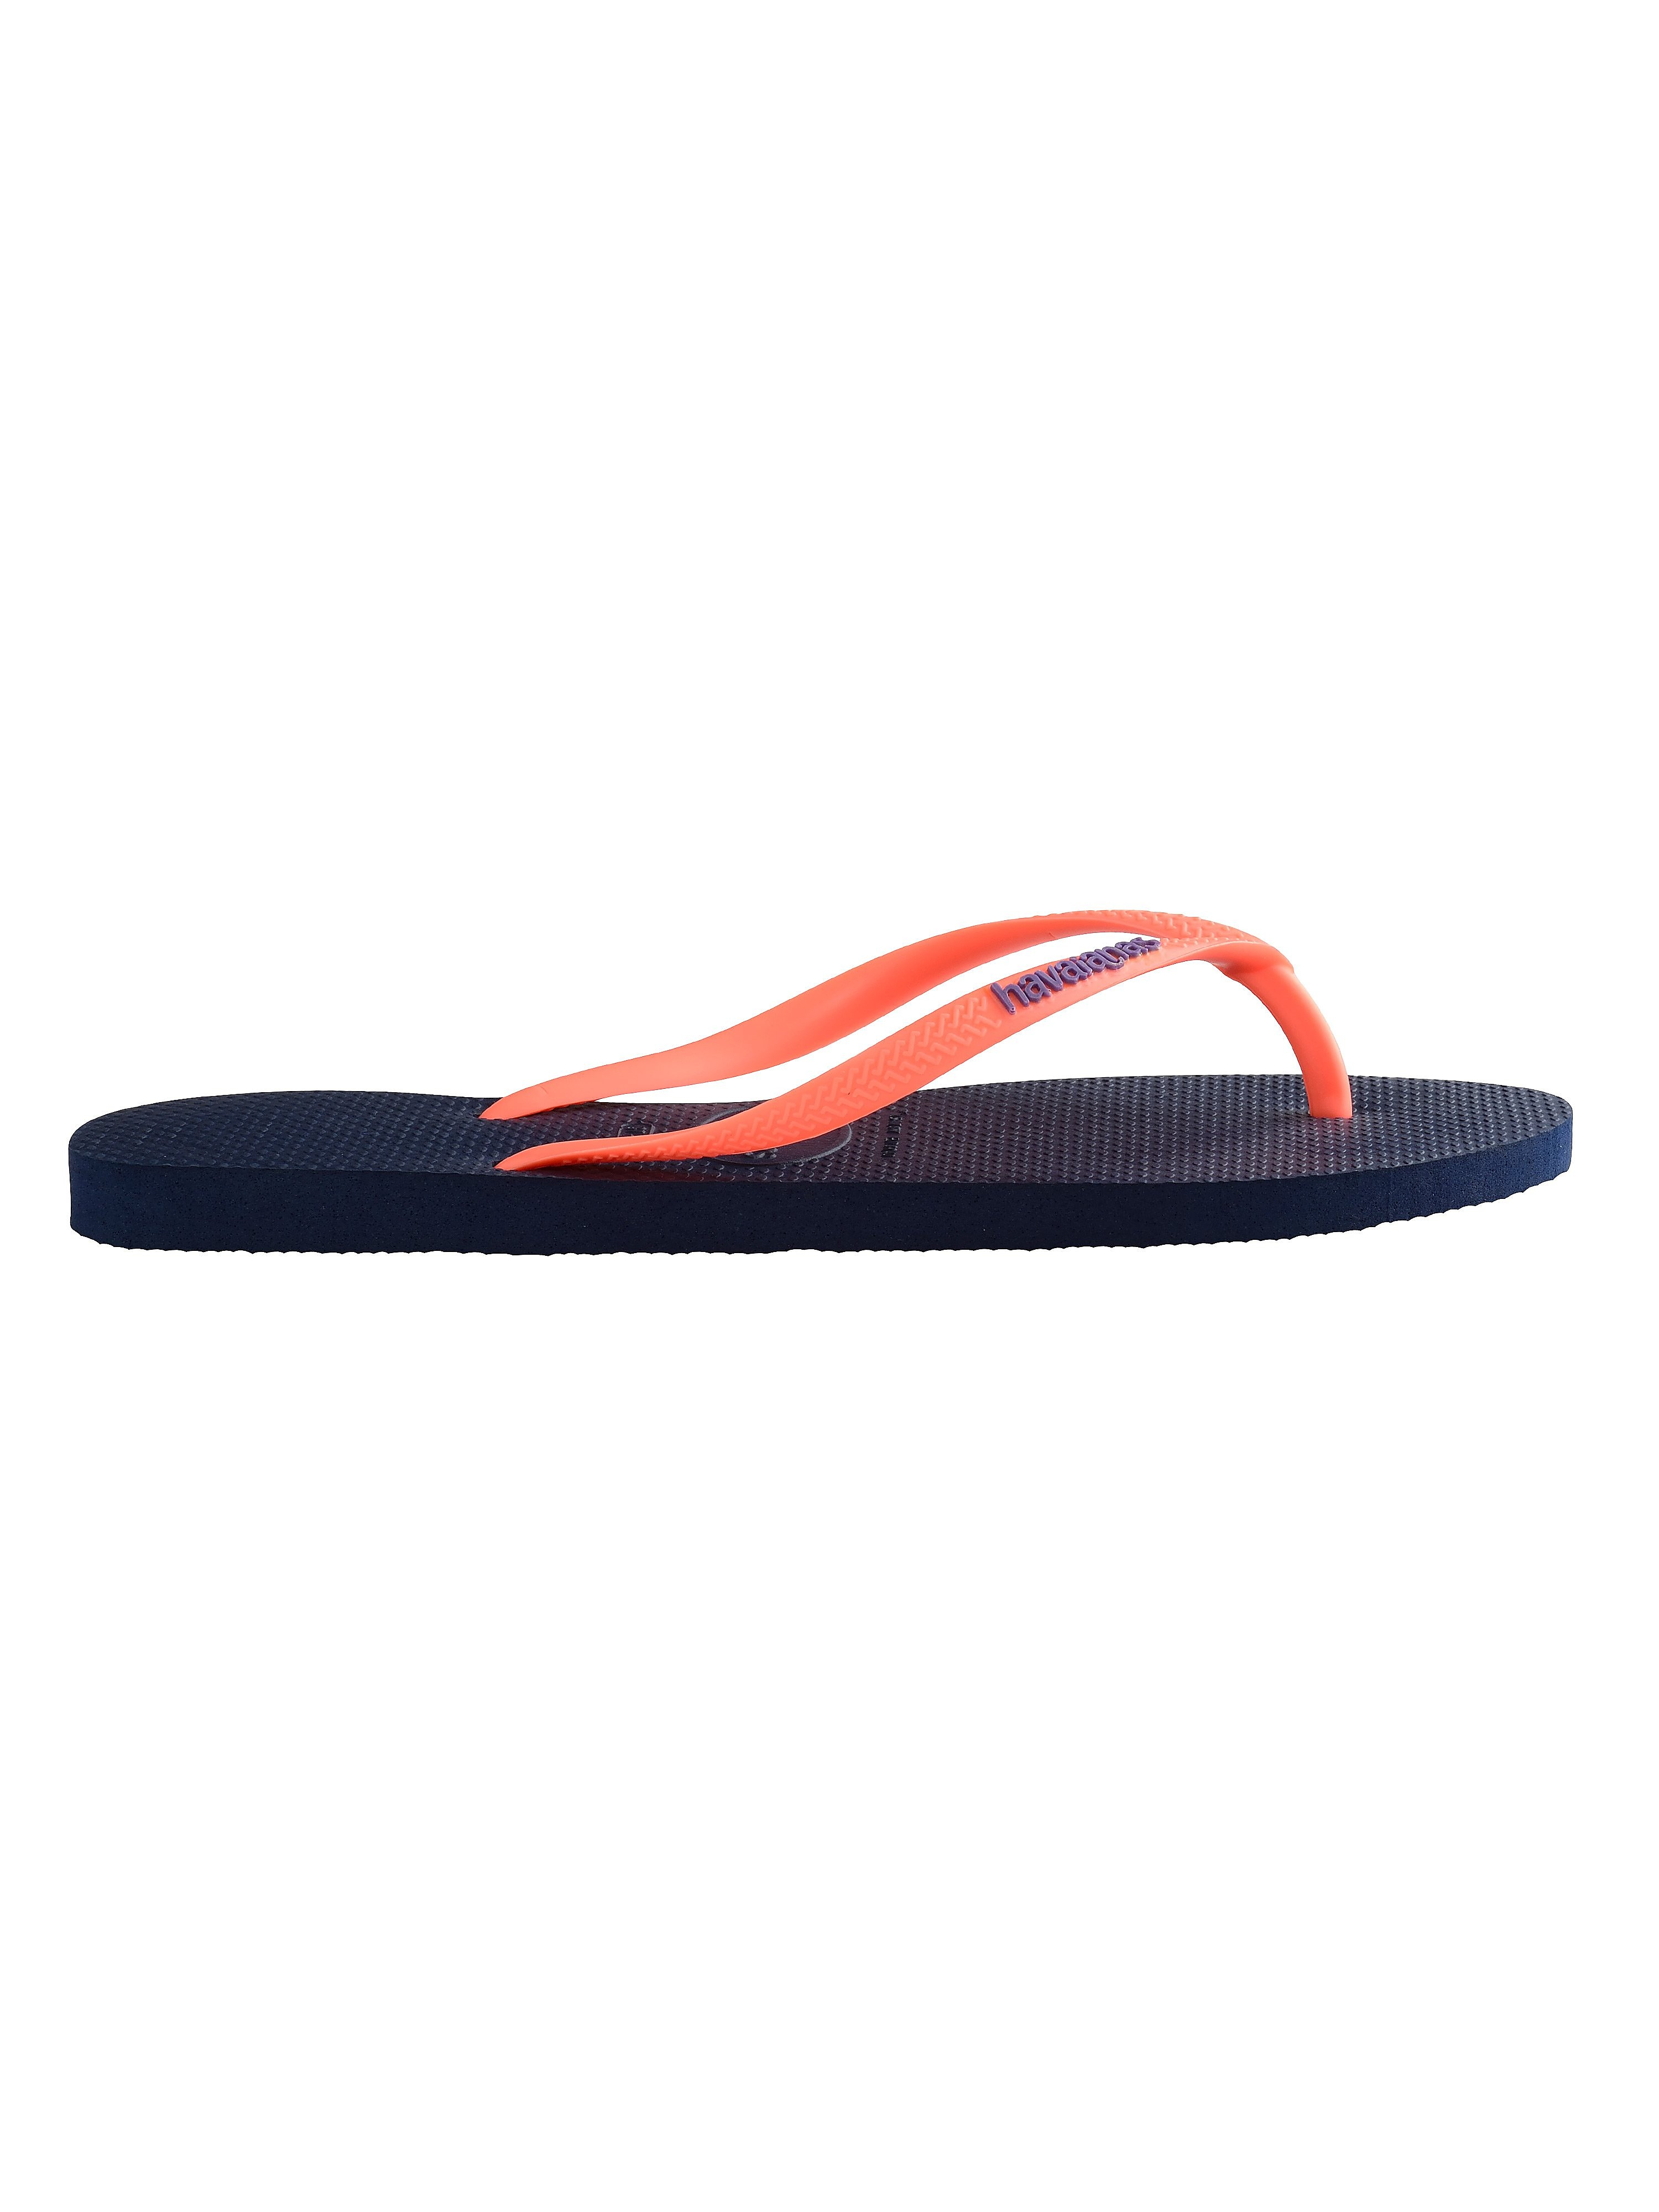 Havaianas Women's Slim Logo Flip Flop - Navy Blue